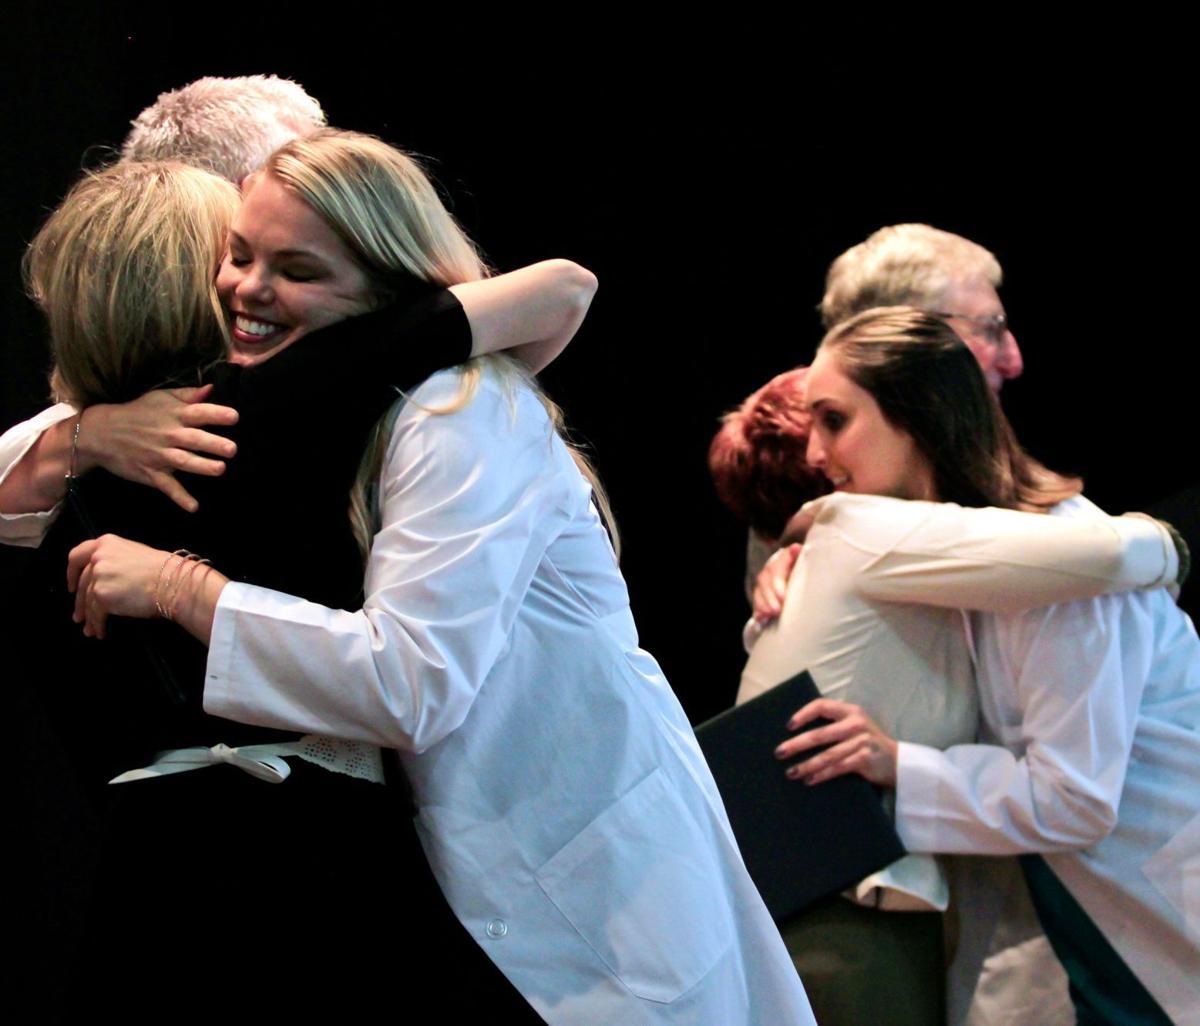 Monica and Laurene hug their professors